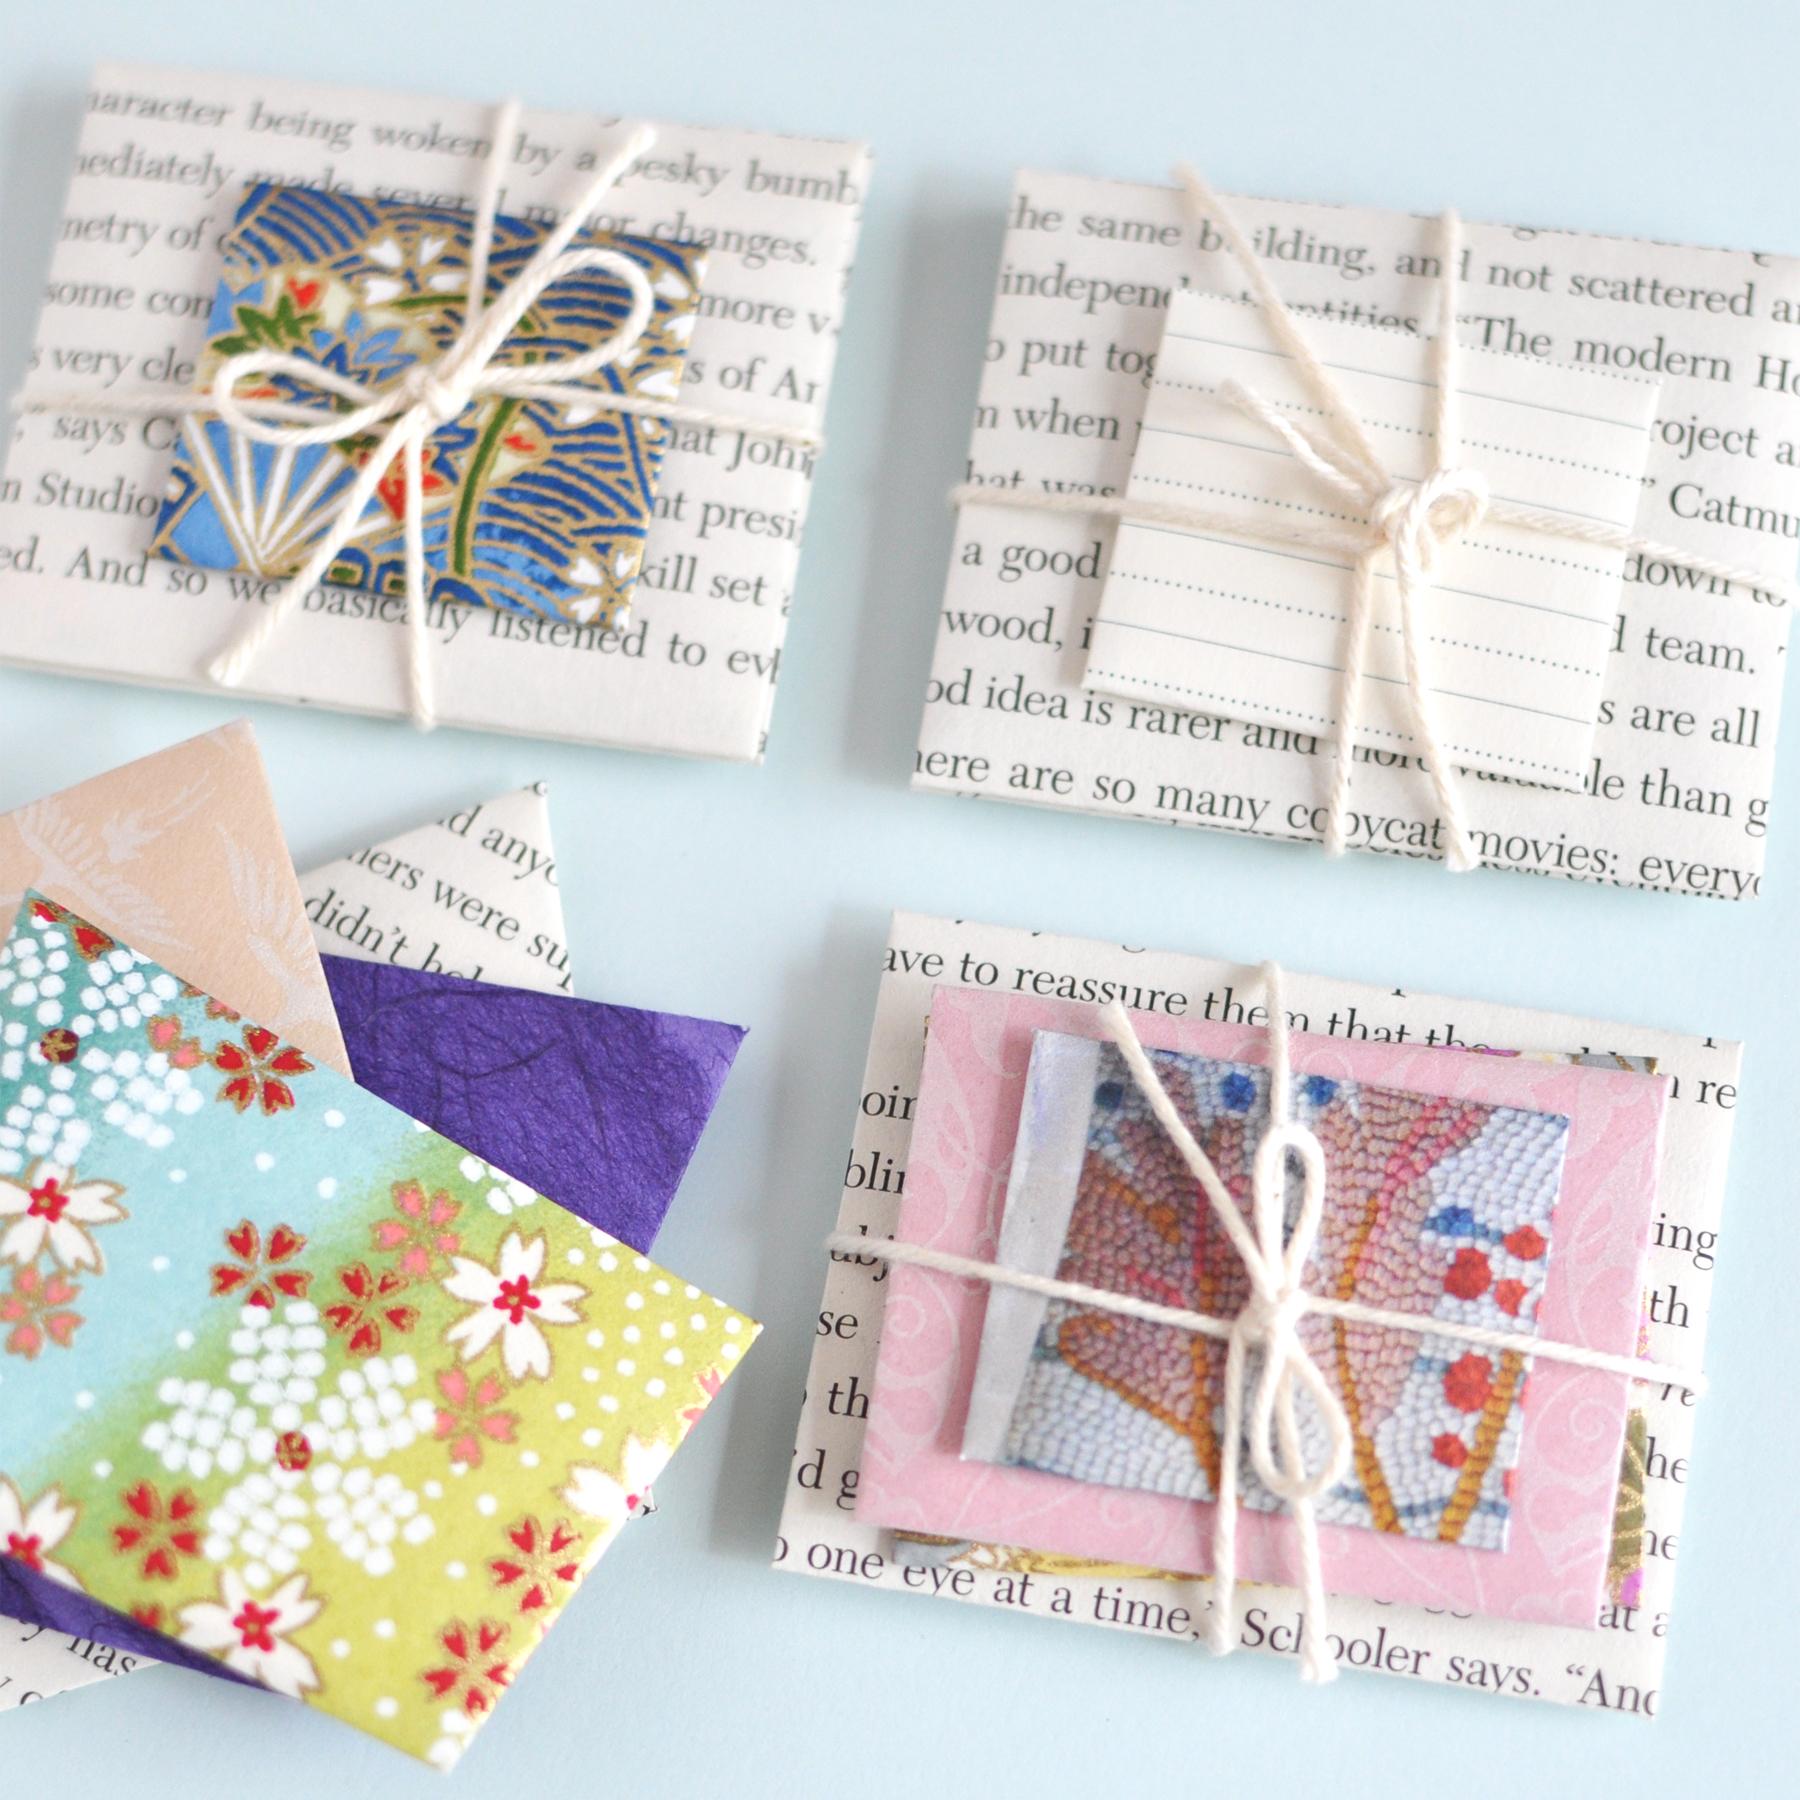 24-05-2019-Handmade-Envelope-and-Journal-Package-by-Christie-Zimmer.jpg